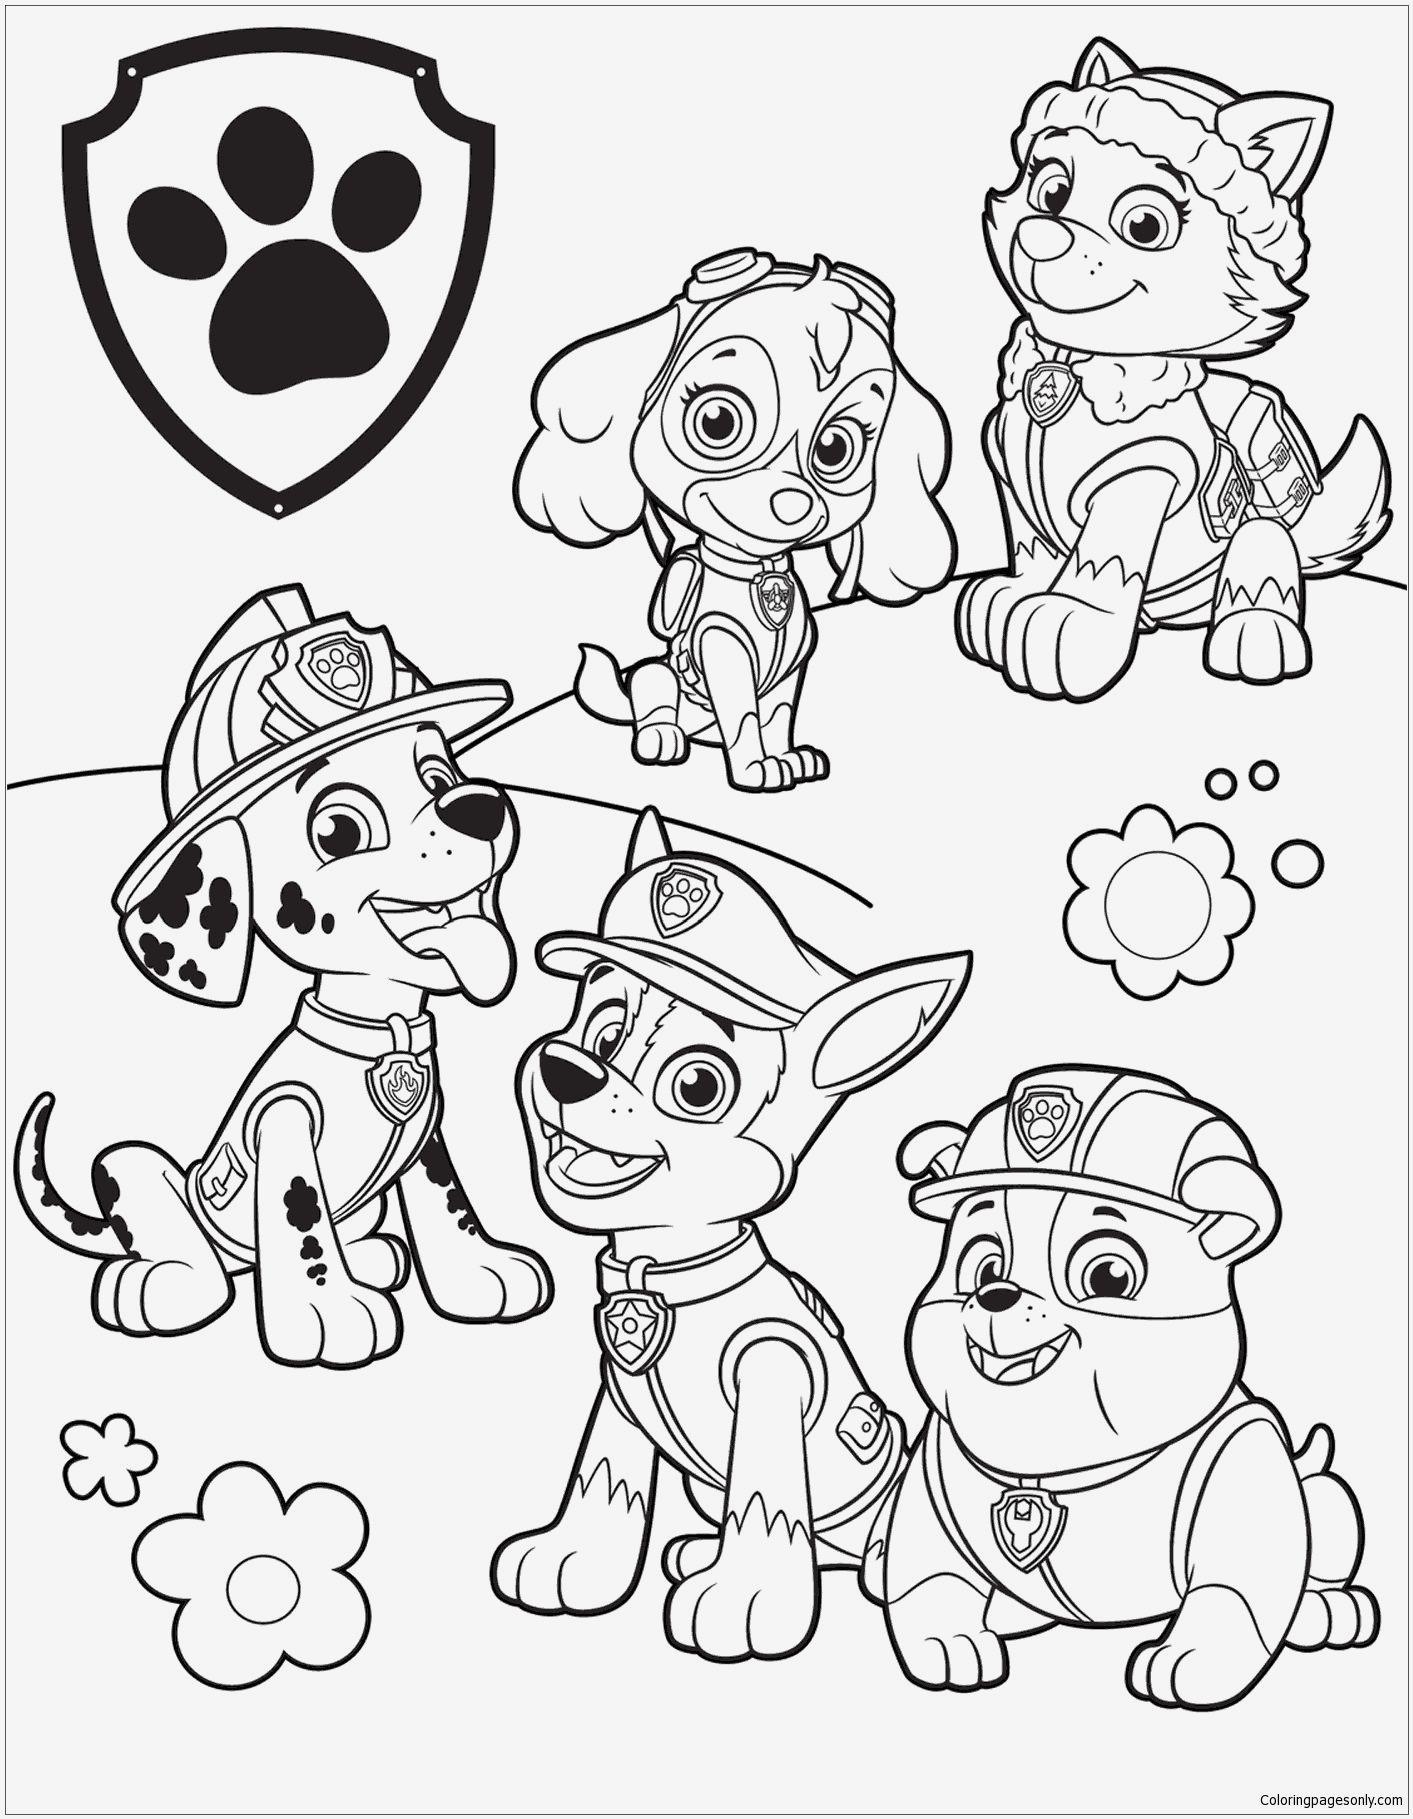 Paw Patrol Sky Ausmalbilder Einzigartig Inspirational Marshall Paw Patrol Coloring Page Coloring Pages Sammlung